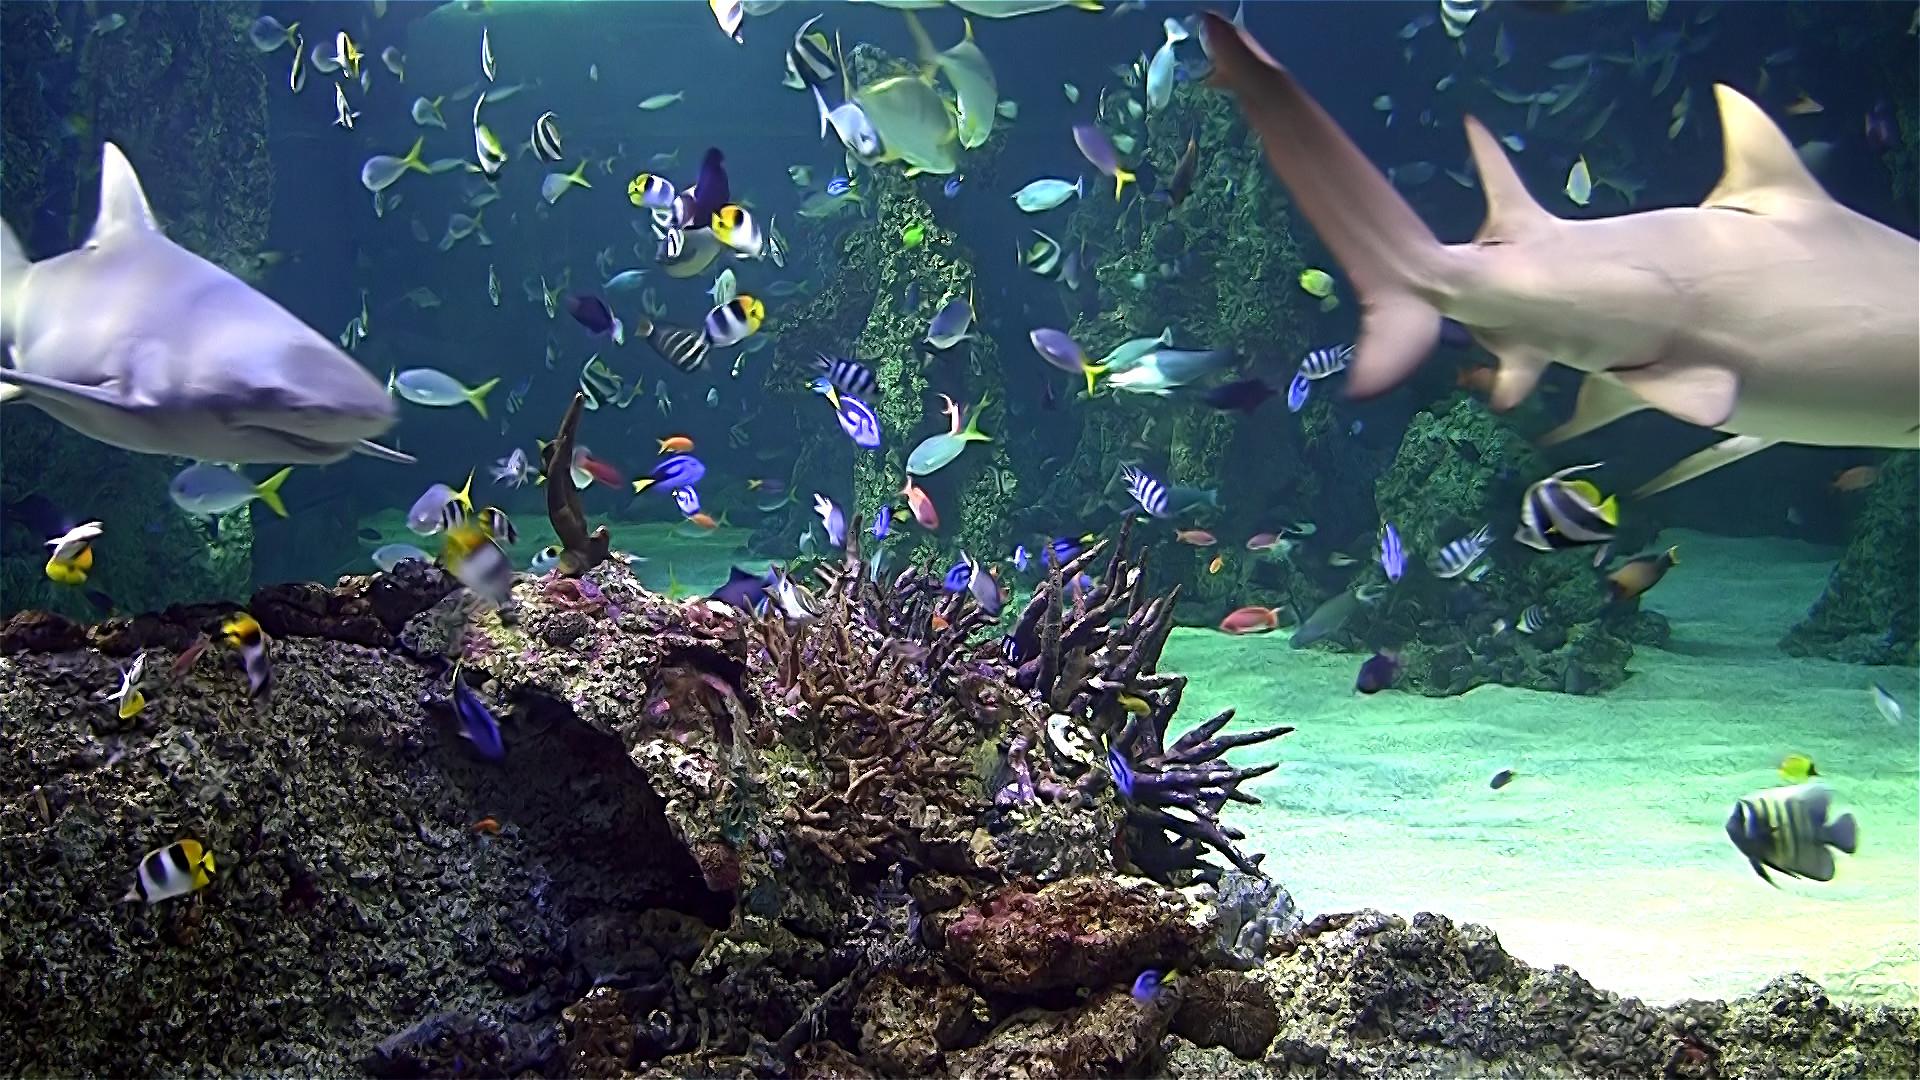 Aquarium Live Wallpaper for PC (55+ images)